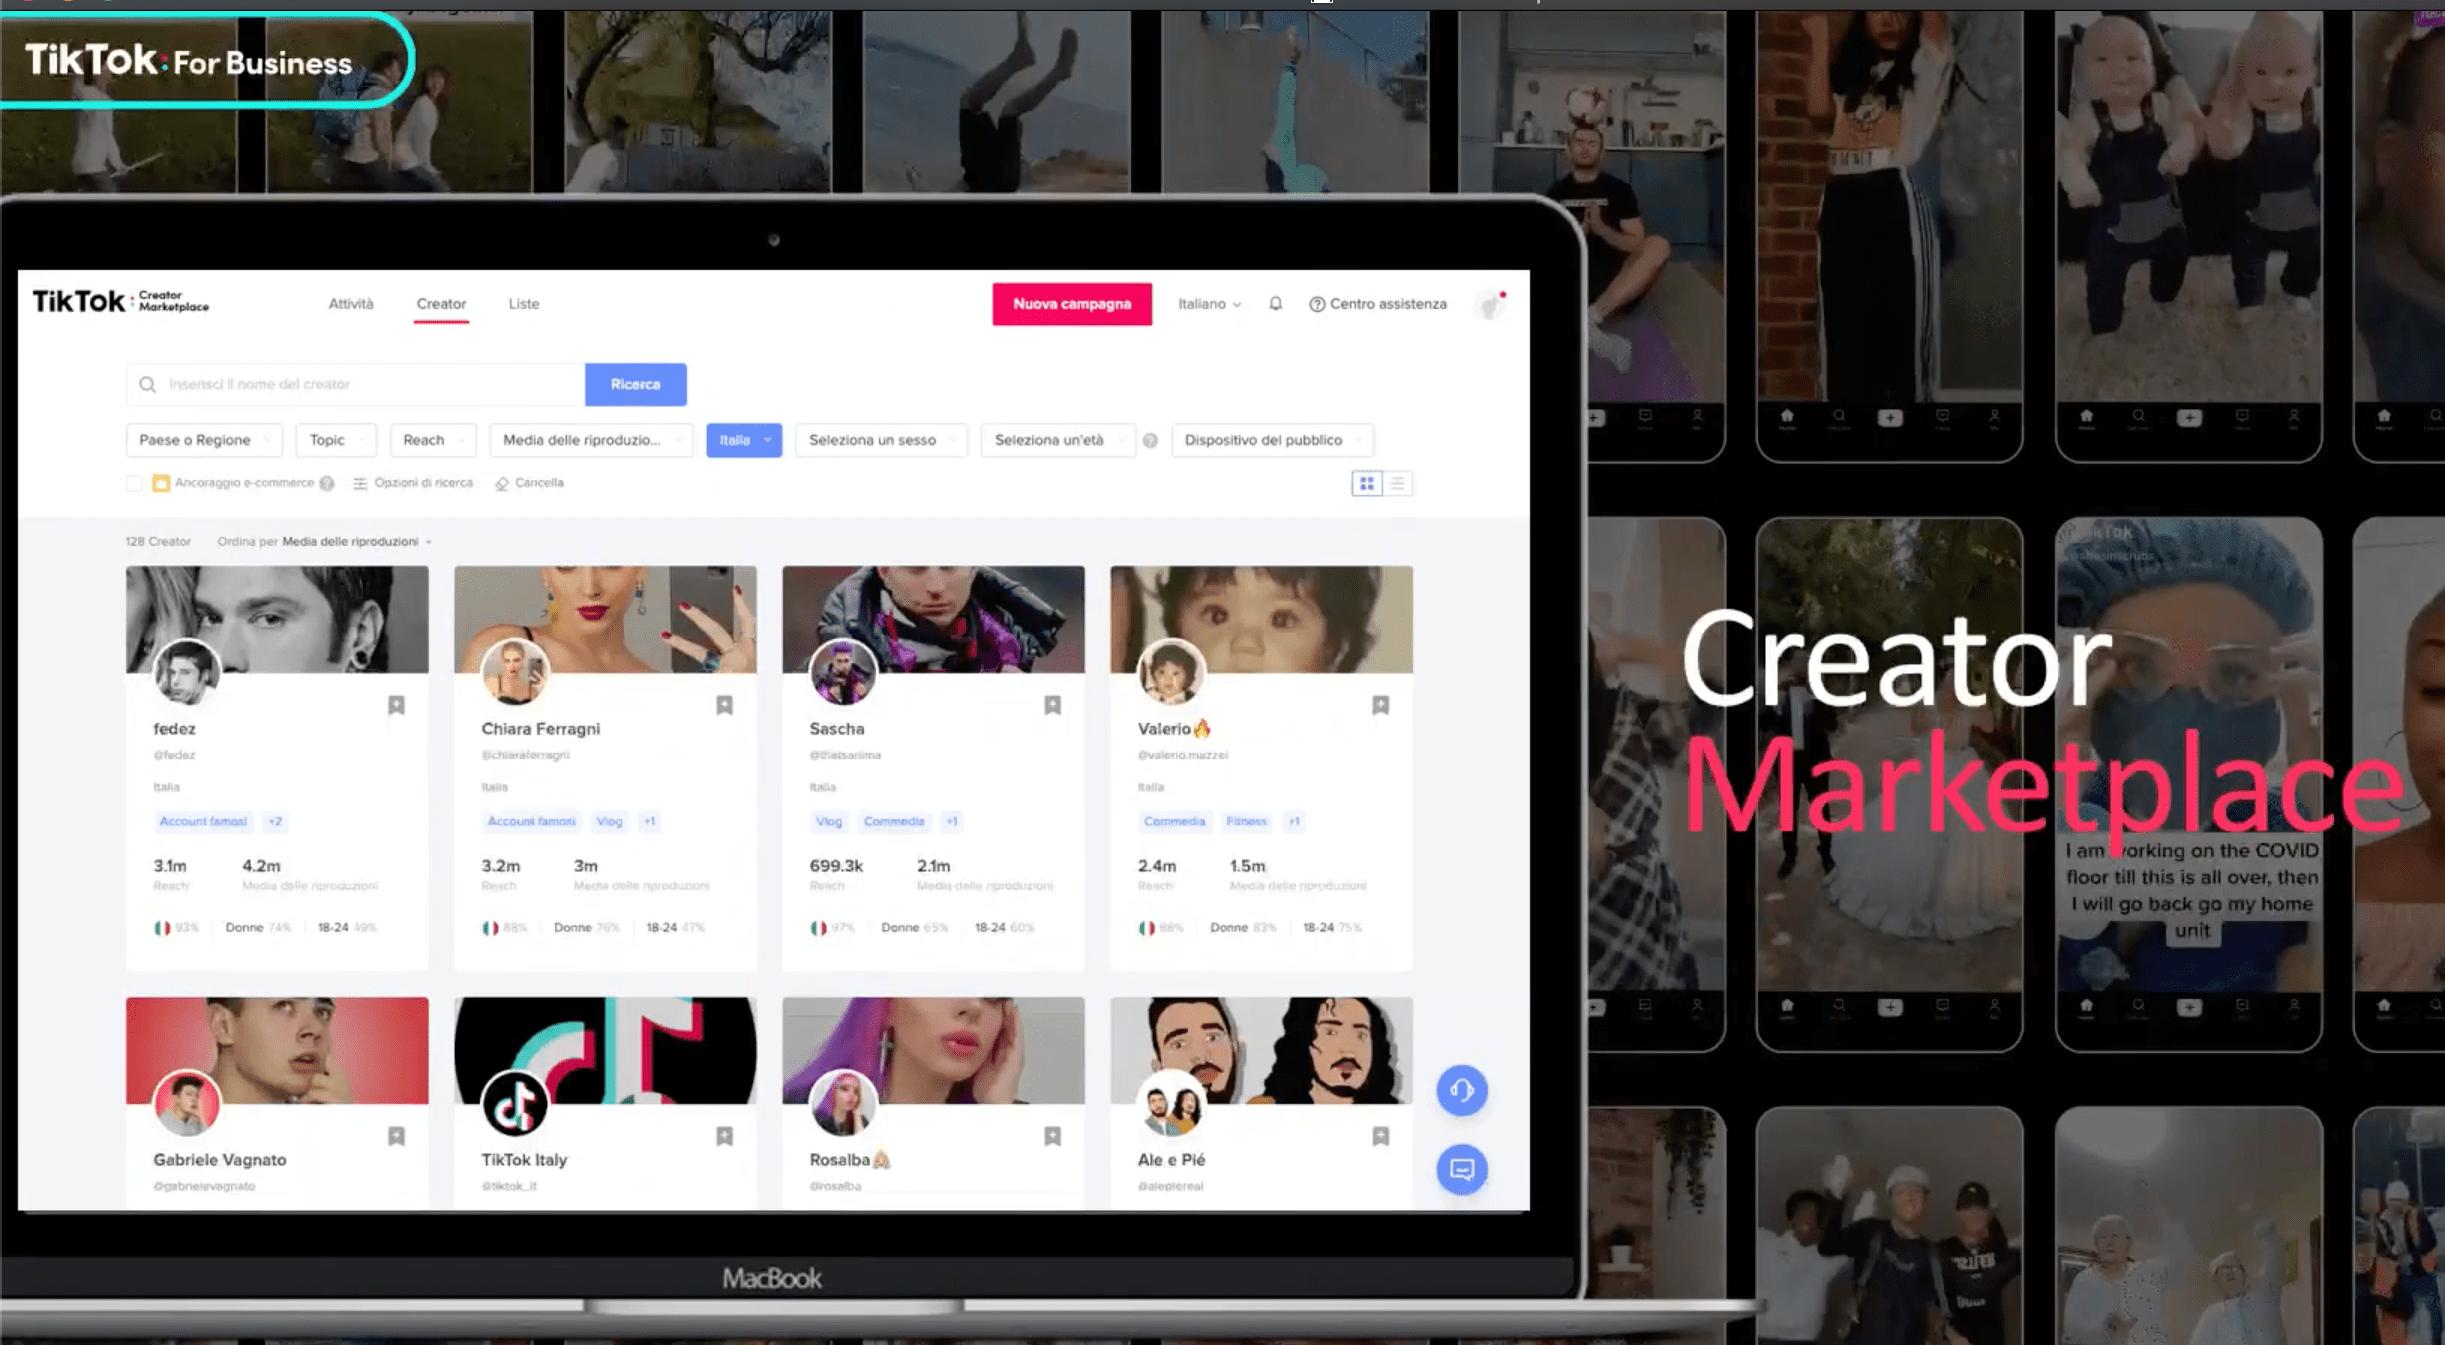 TikTok creators marketplace